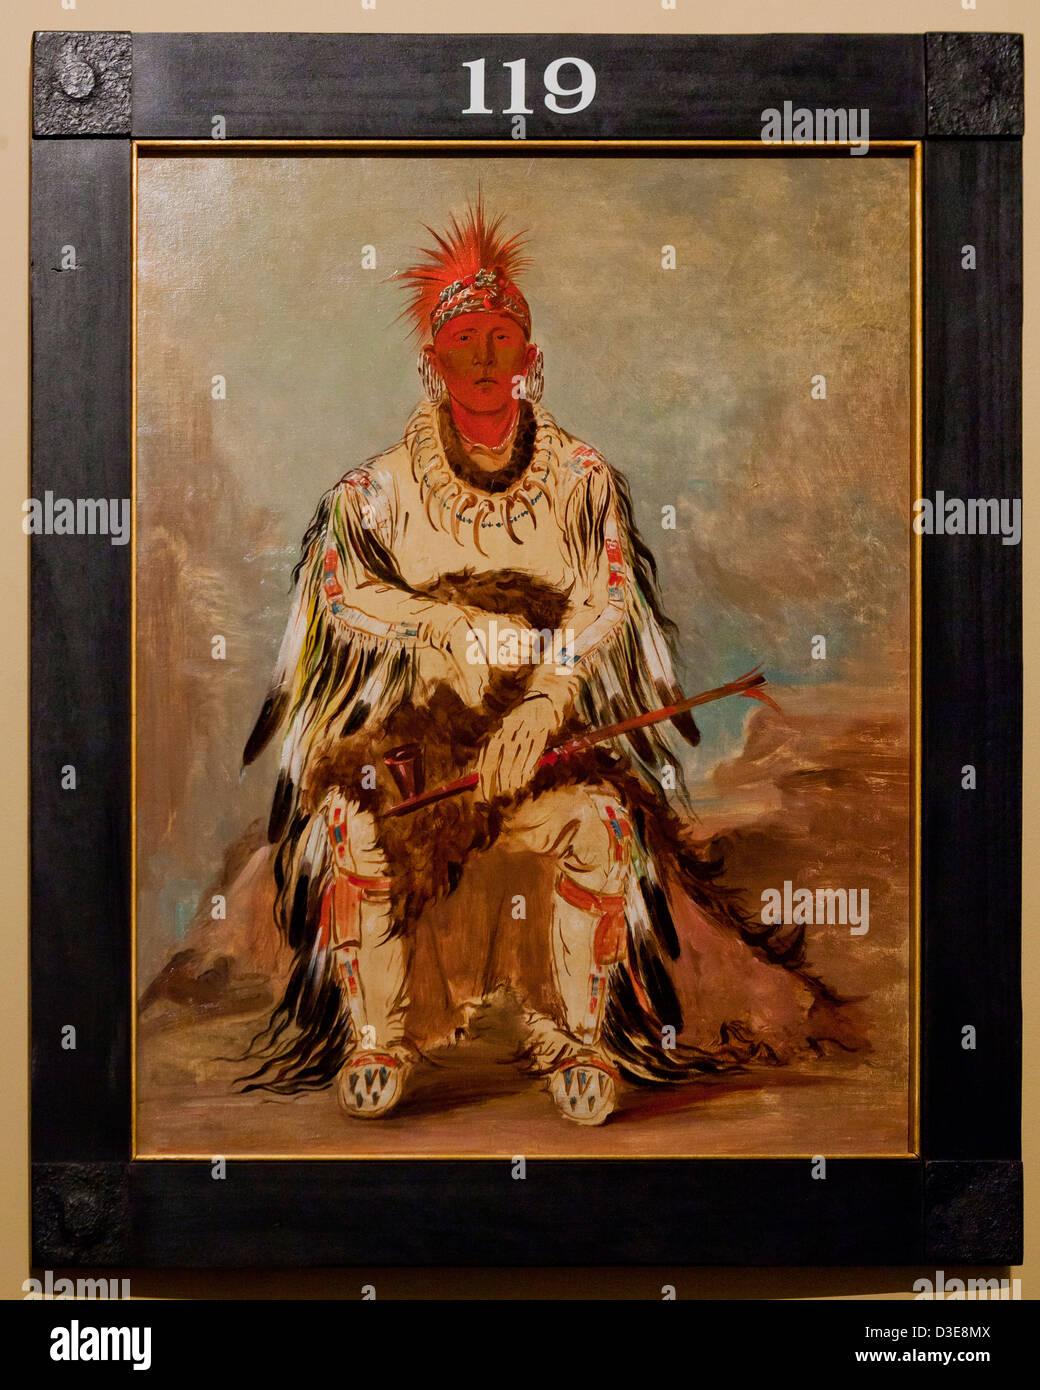 Pas moyen ke sug gah , Jiwere-Nutachi Otoe chef indien par George Catlin Photo Stock